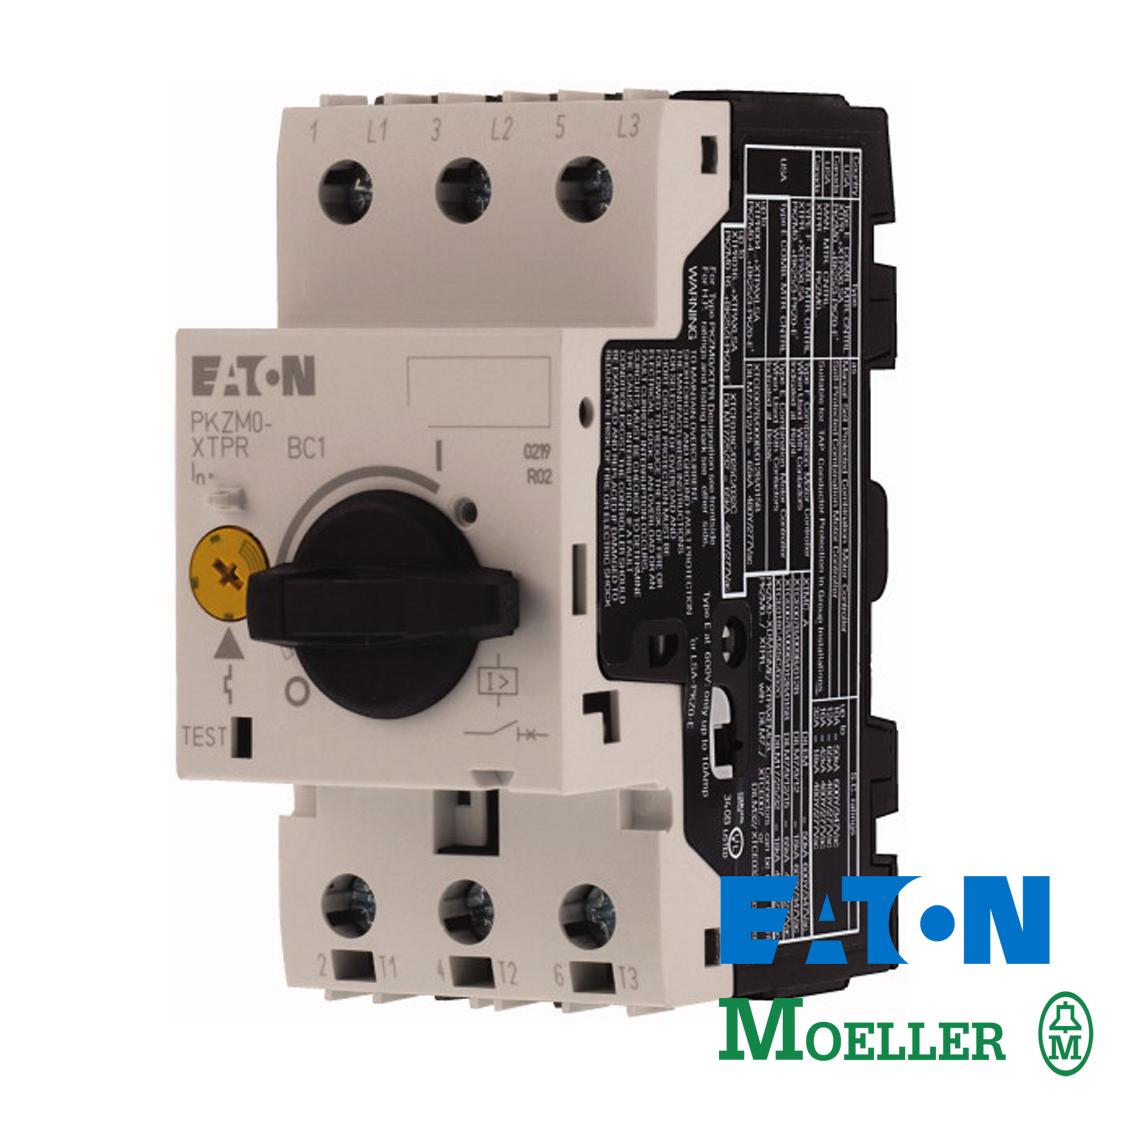 Motorni zaštitni prekidač PKZM0-12 Eaton-Moeller Elektro Vukojevic